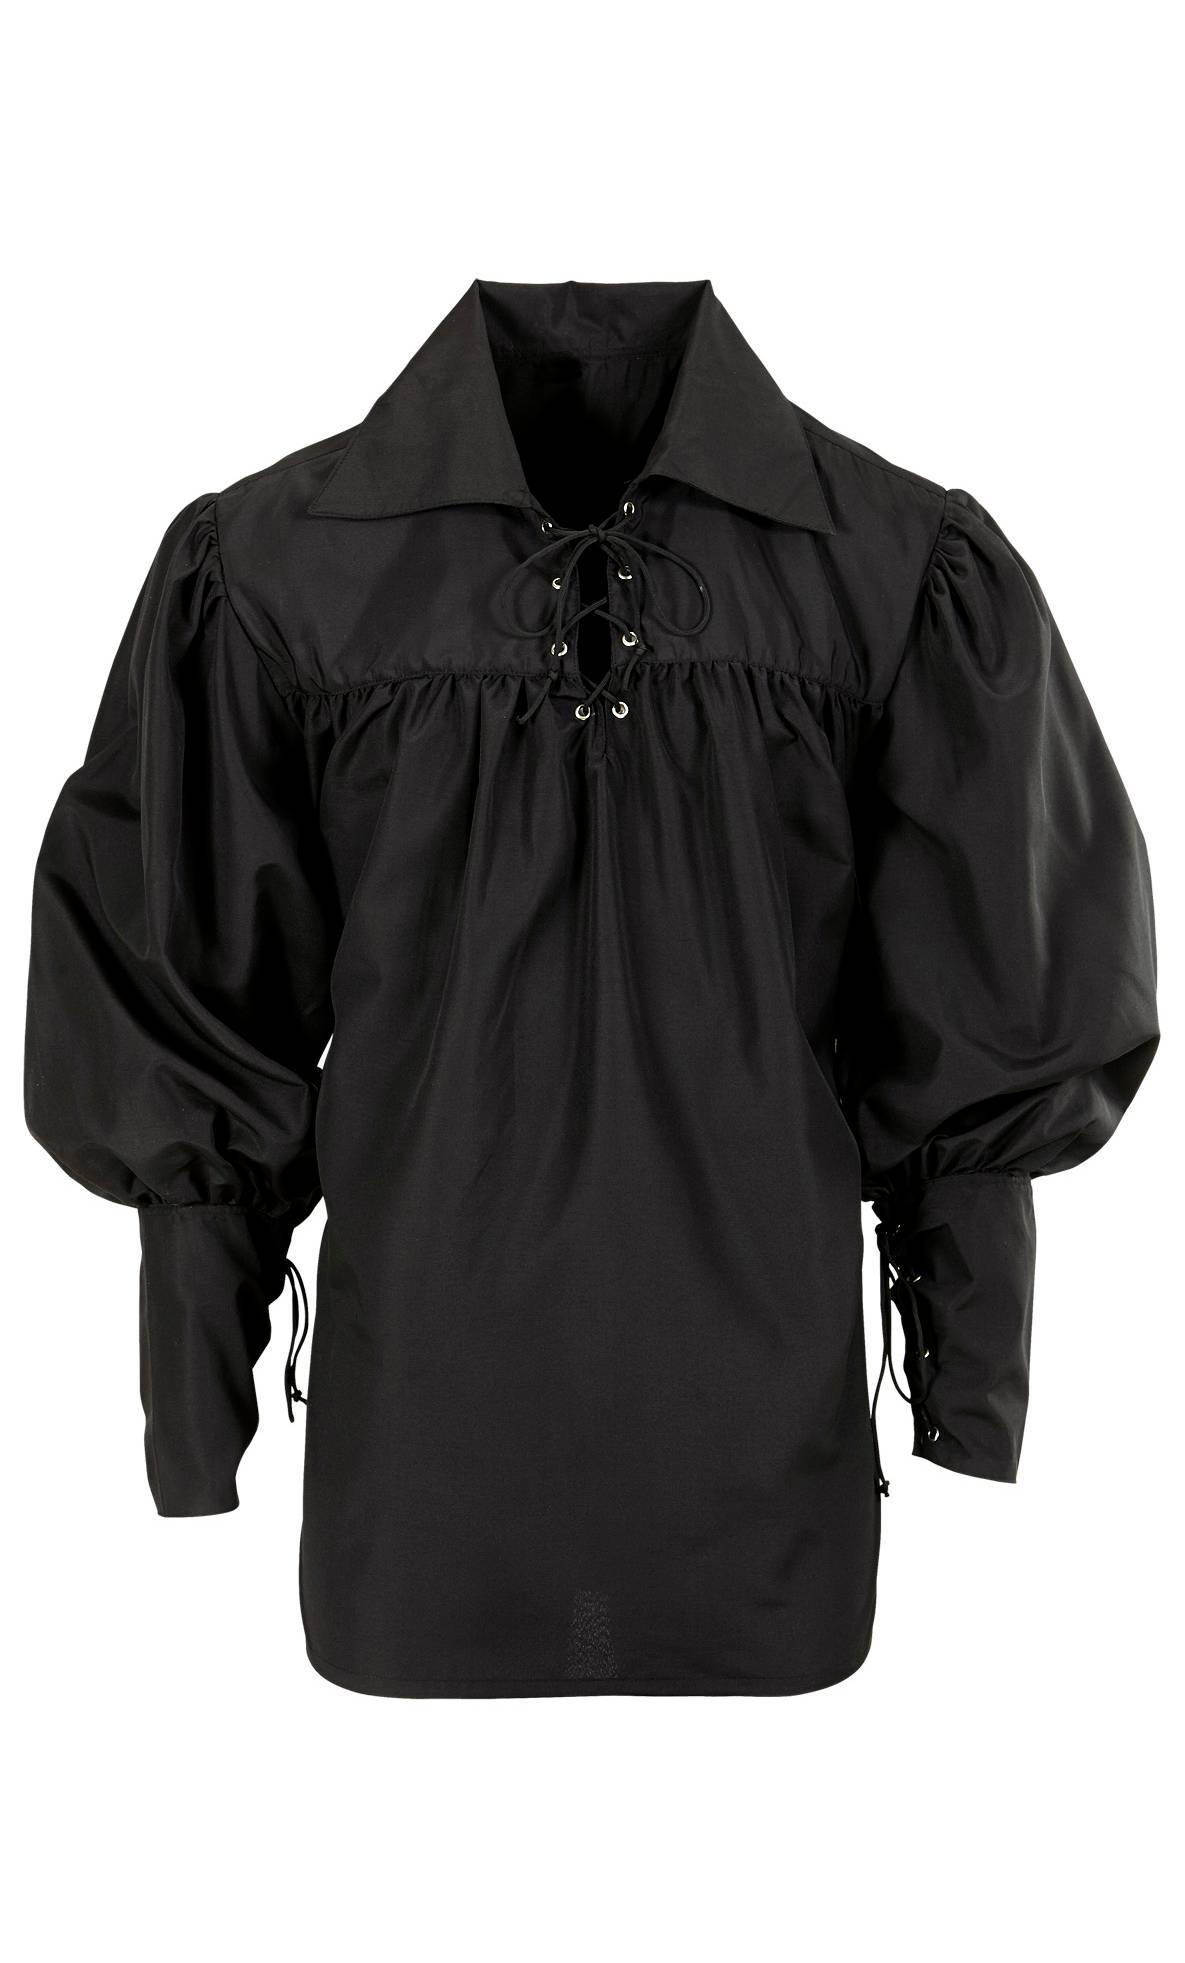 chemise poque noire homme grande taille xl w10104. Black Bedroom Furniture Sets. Home Design Ideas